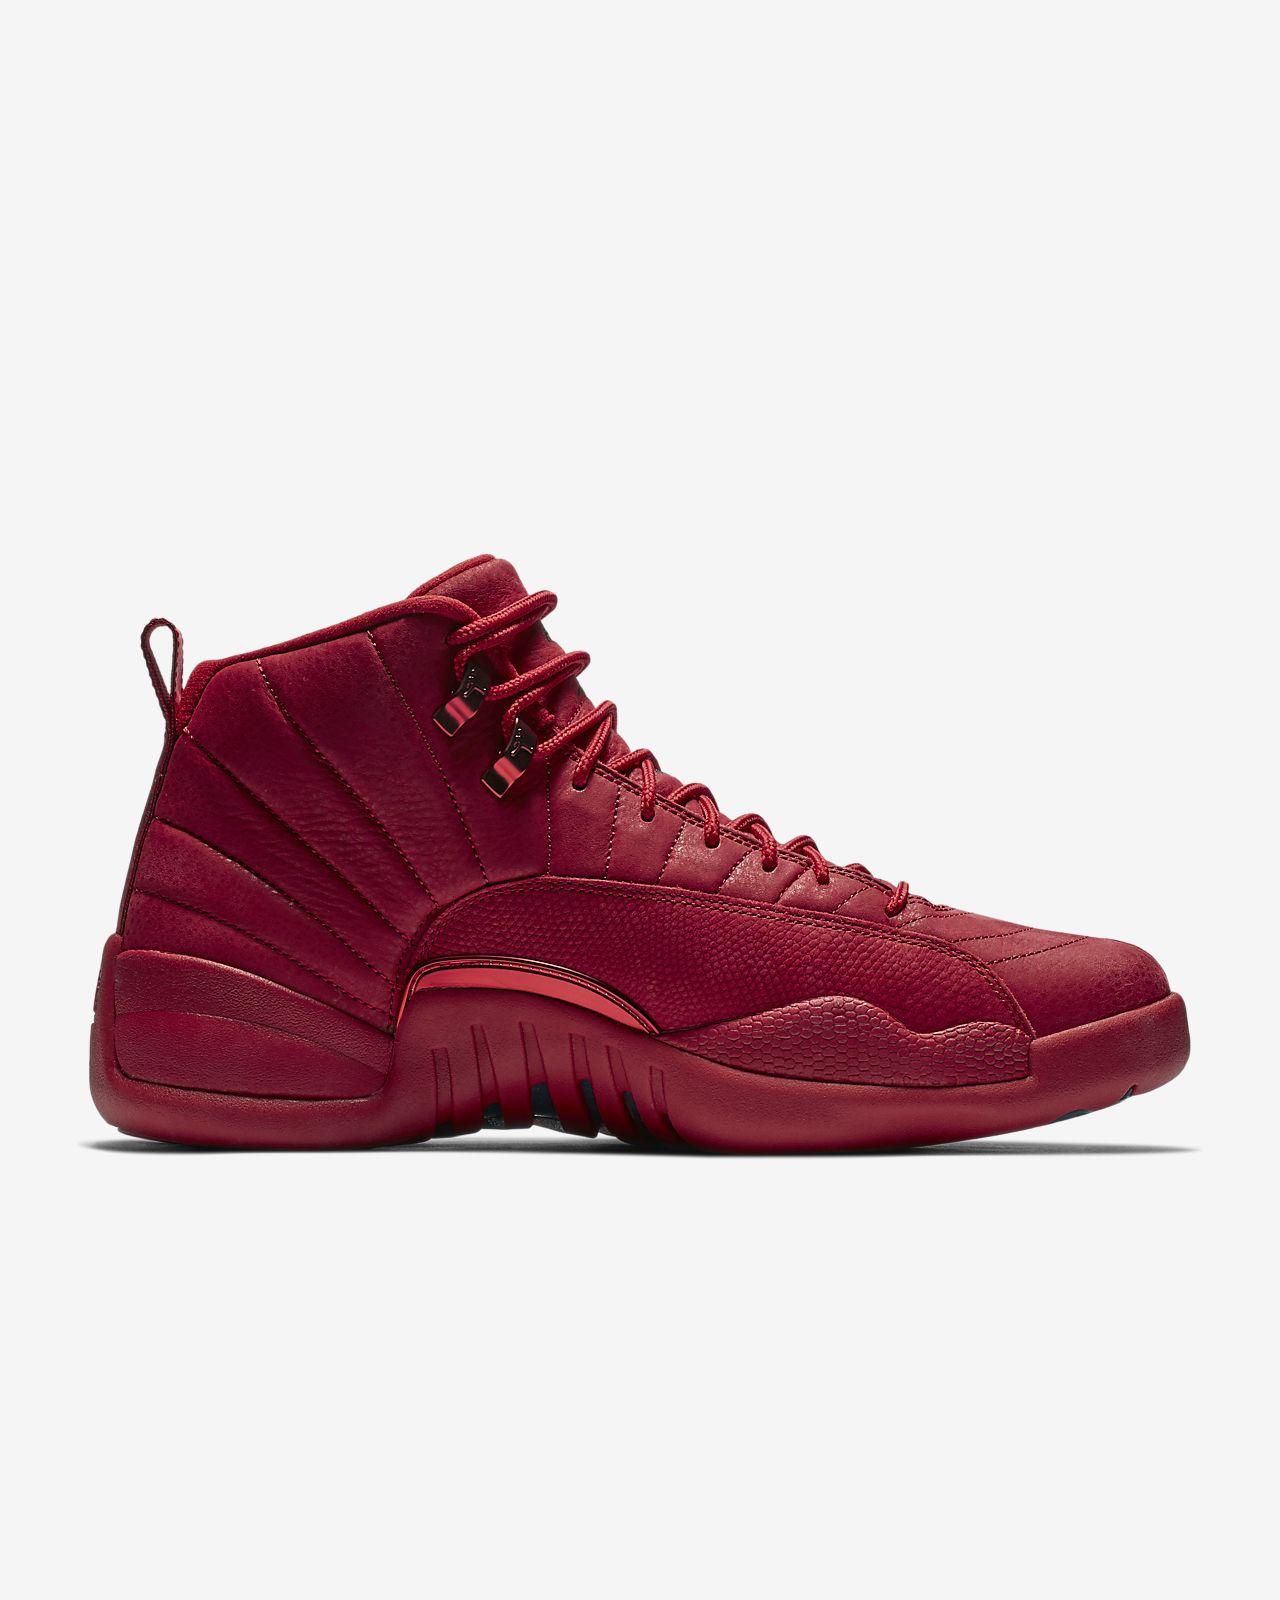 d6a326f1f8b5d3 Air Jordan 12 Retro Men s Shoe. Nike.com IN